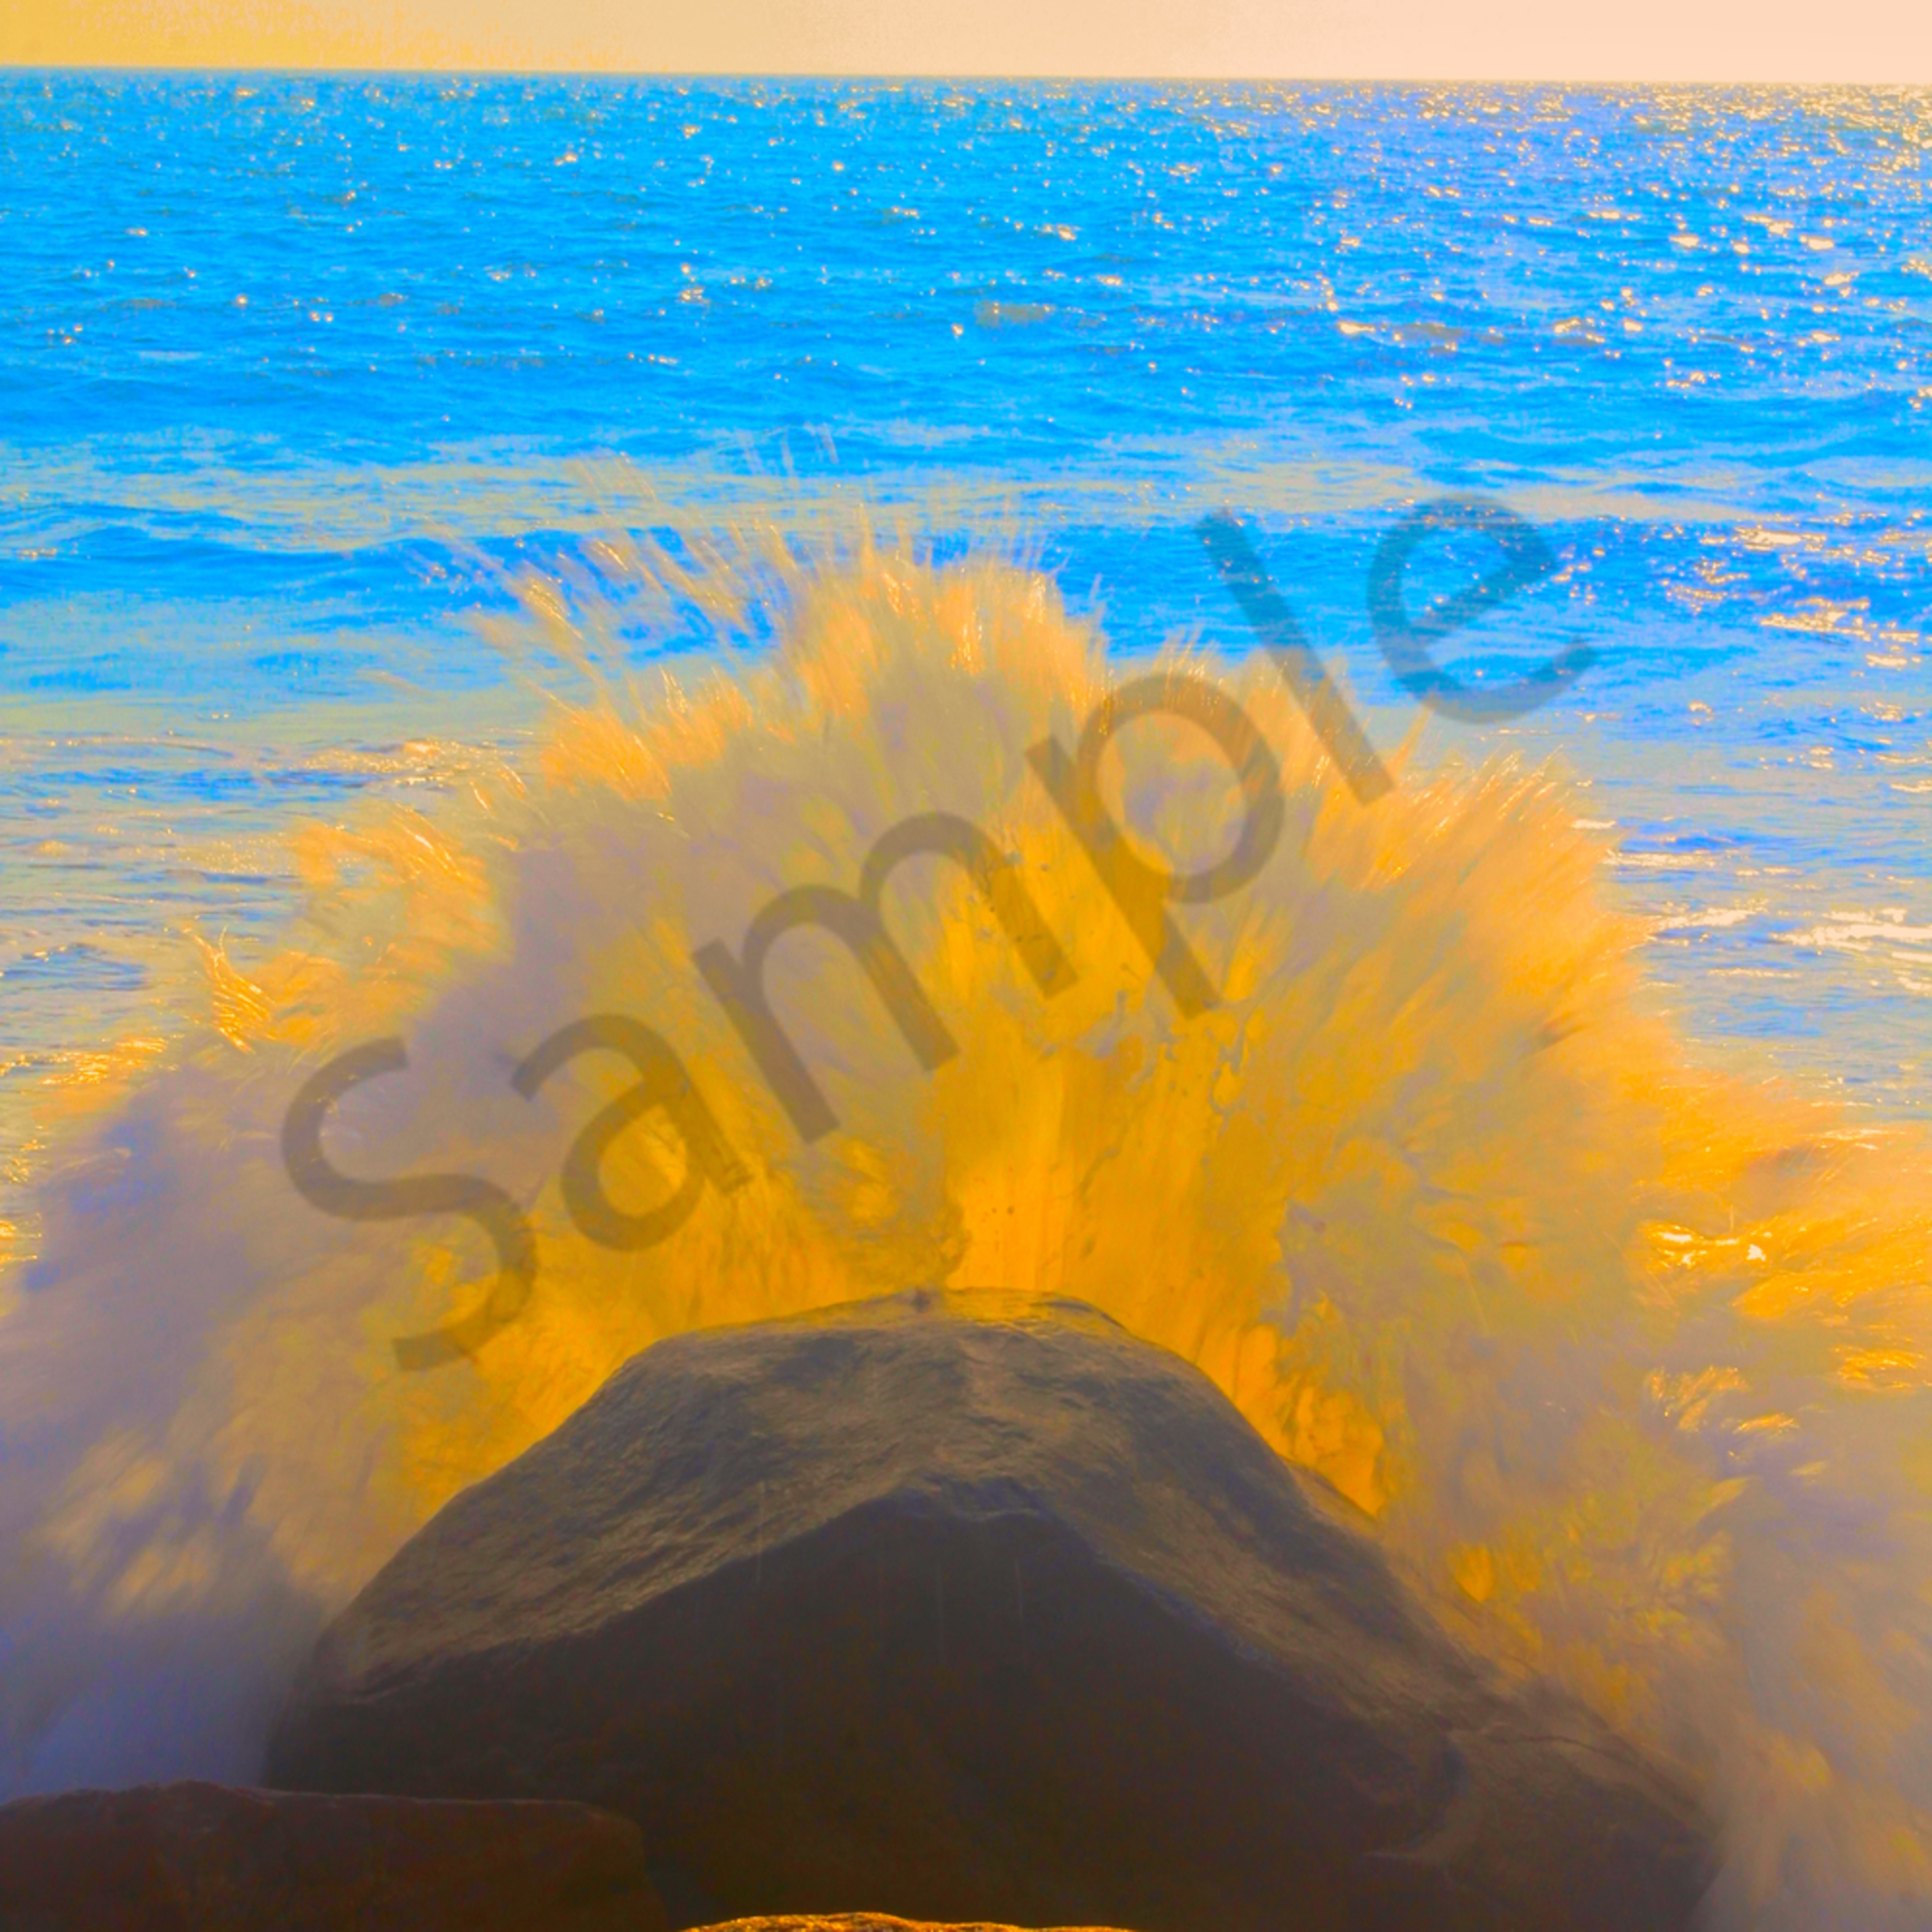 Crashing wave website l4azx3